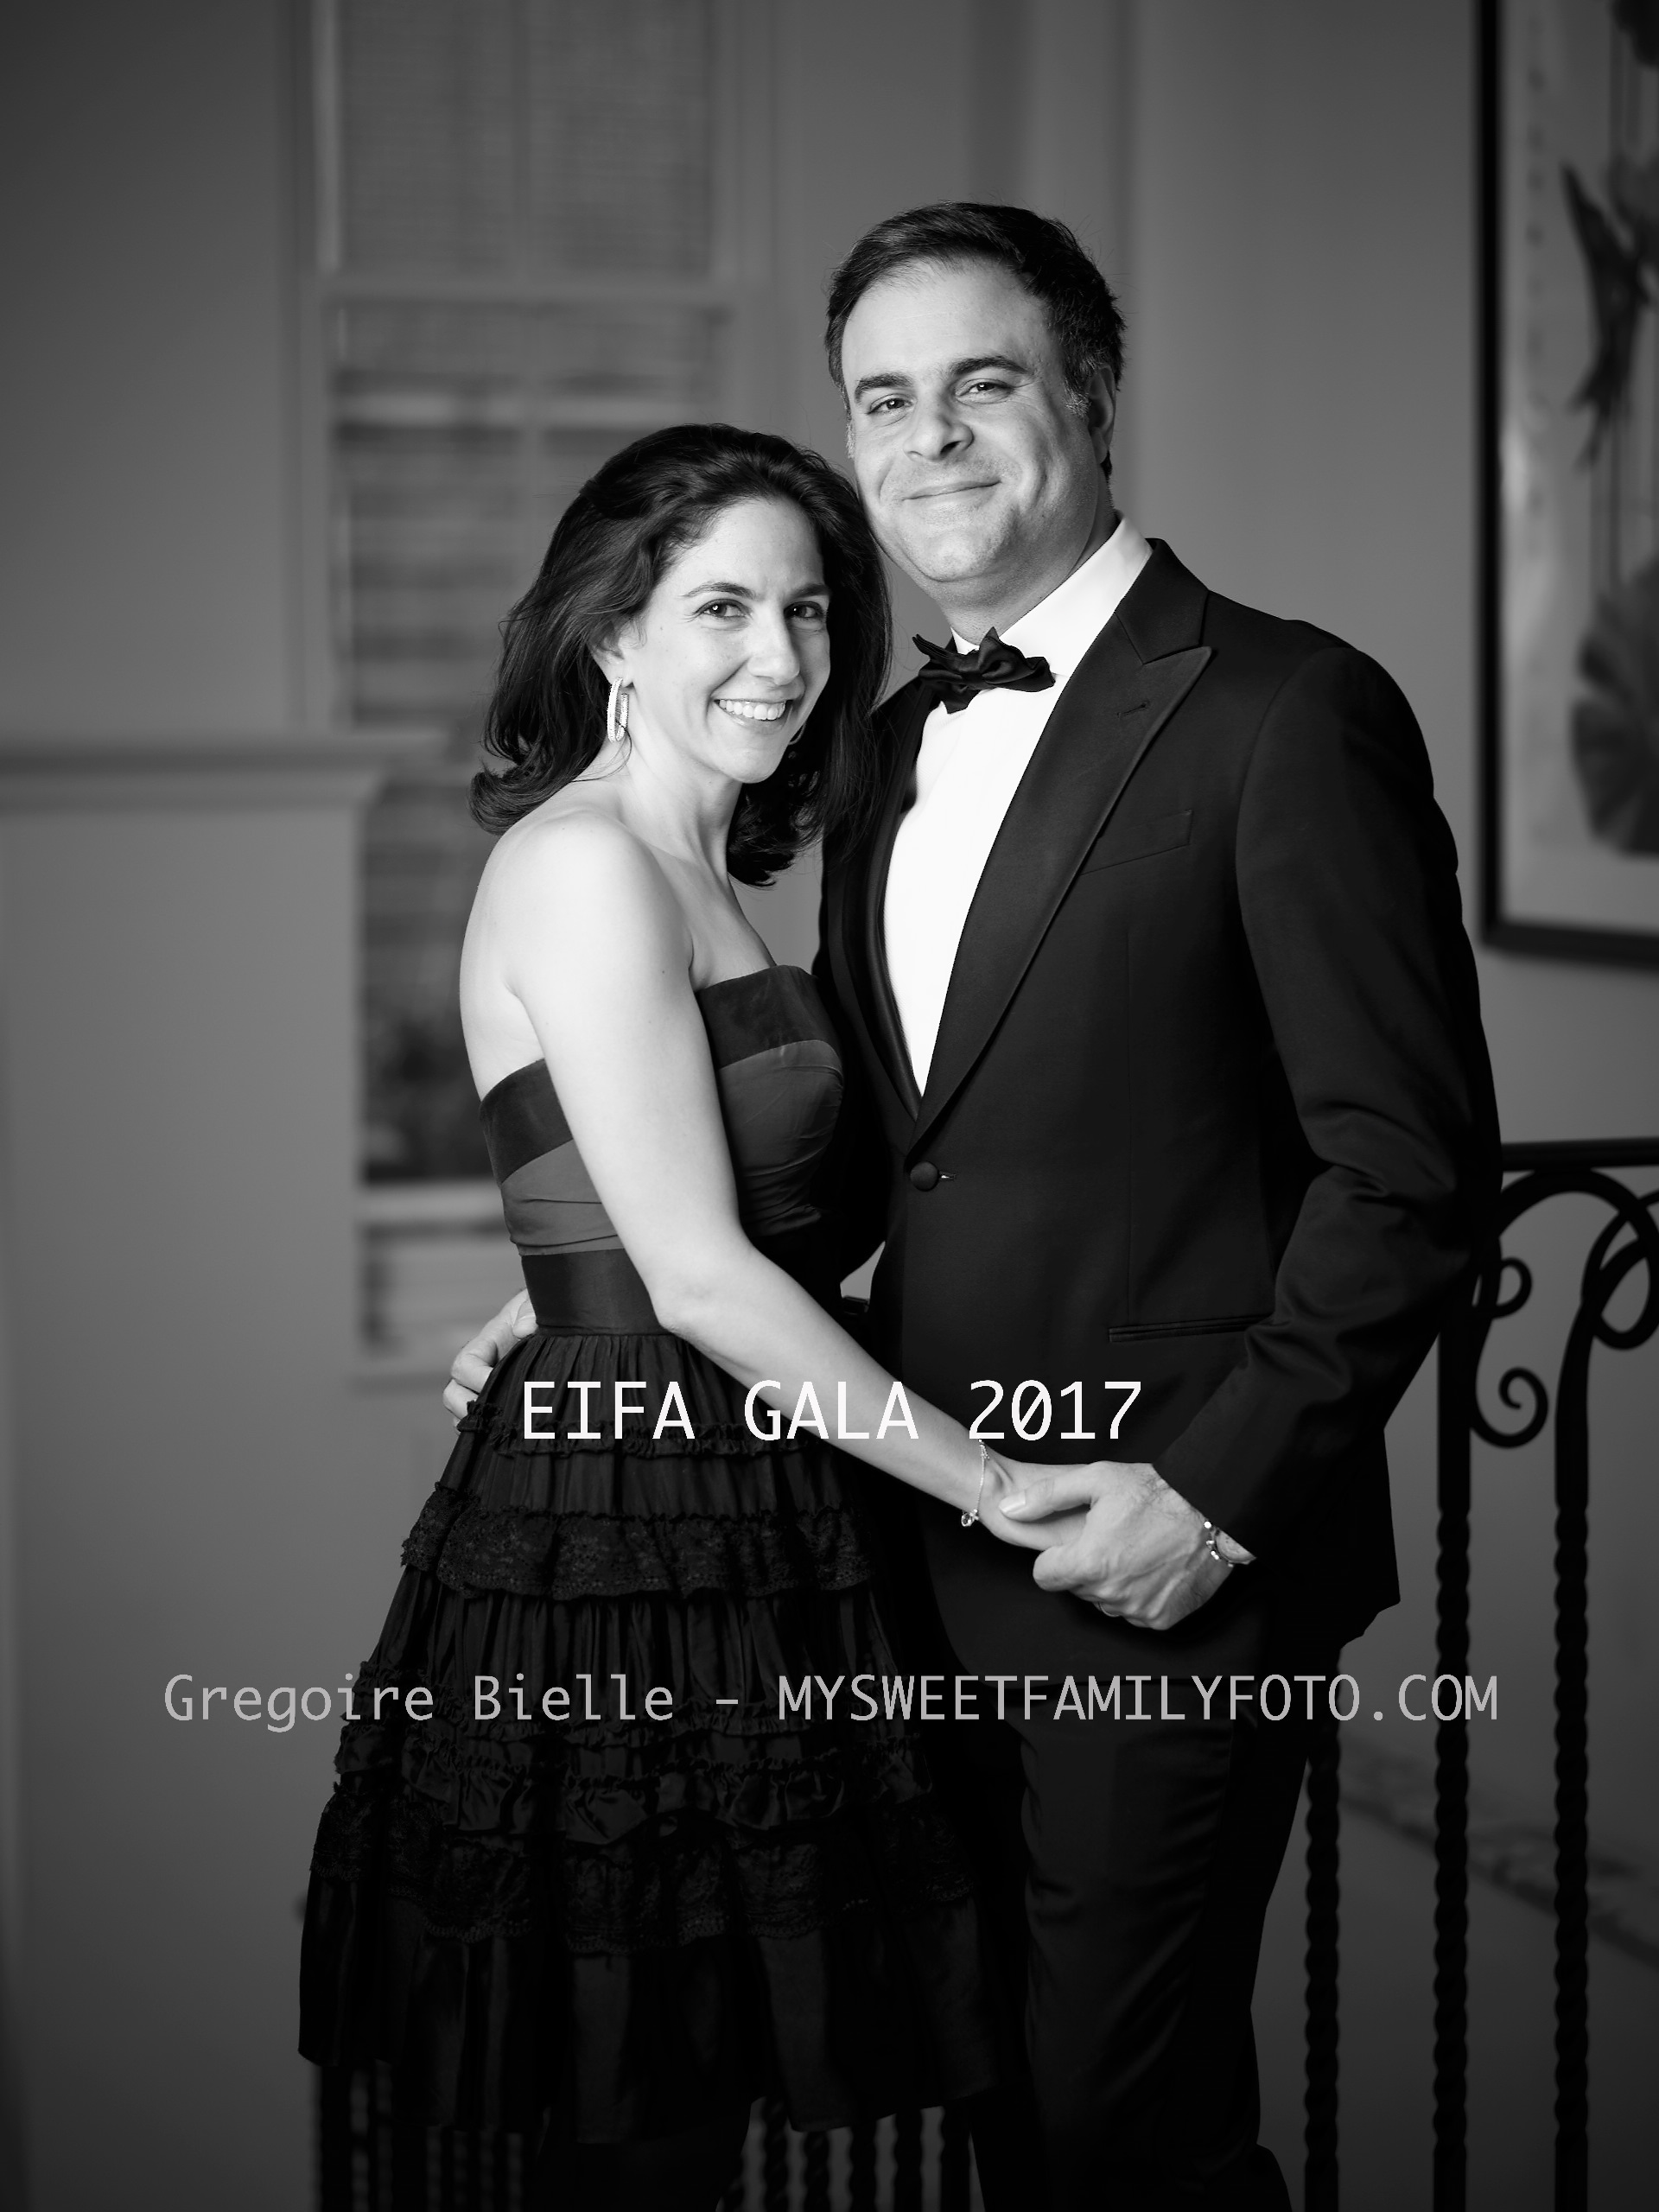 EIFA GALA 1094.jpg